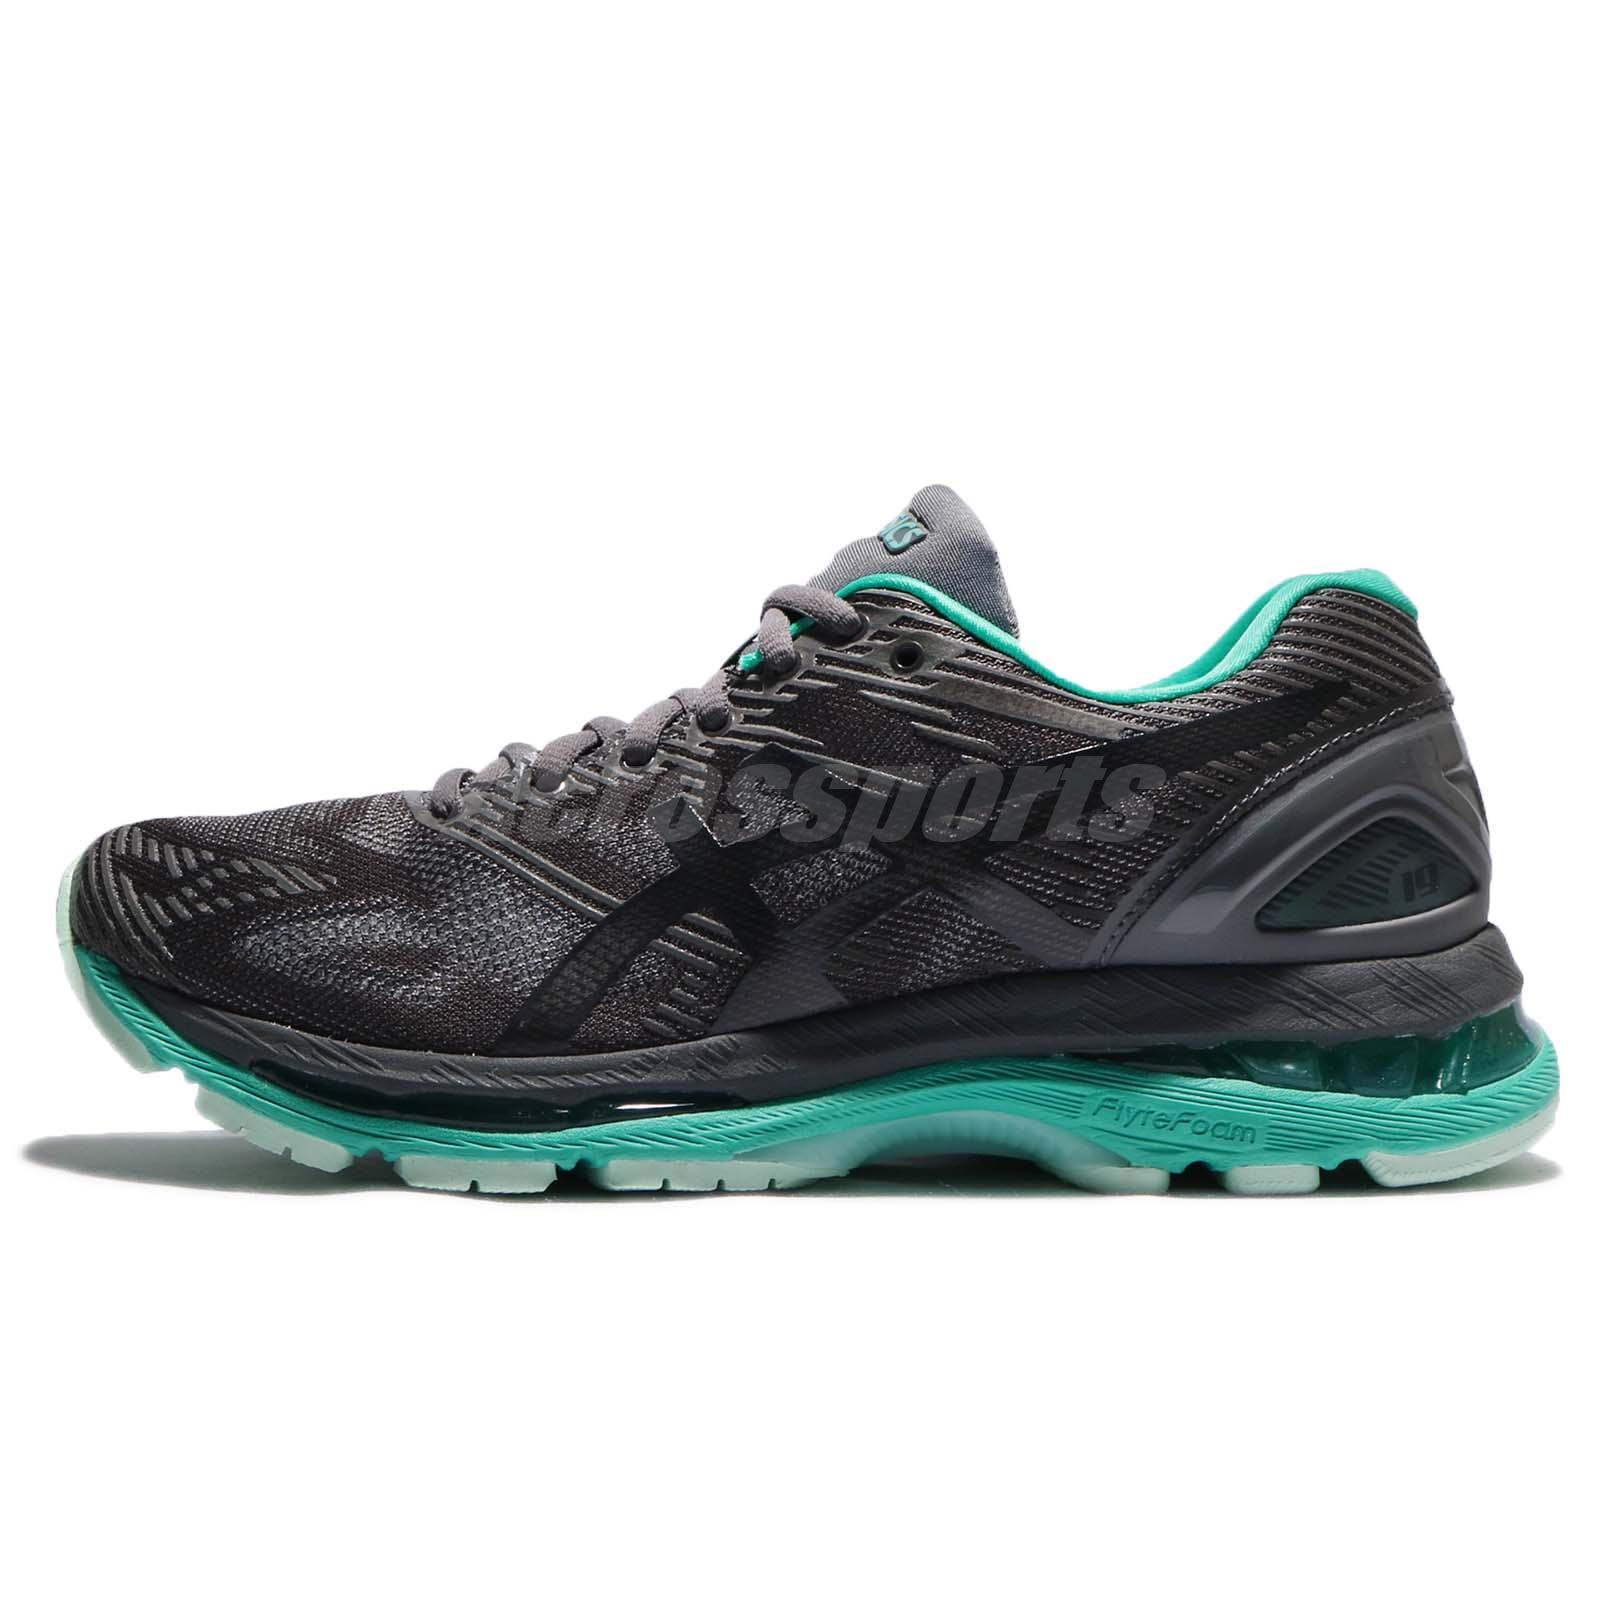 quality design e6d5f af434 Details about Asics Gel-Nimbus 19 Lite-Show Dark Grey Green Women Running  Shoes T7C8N-9590